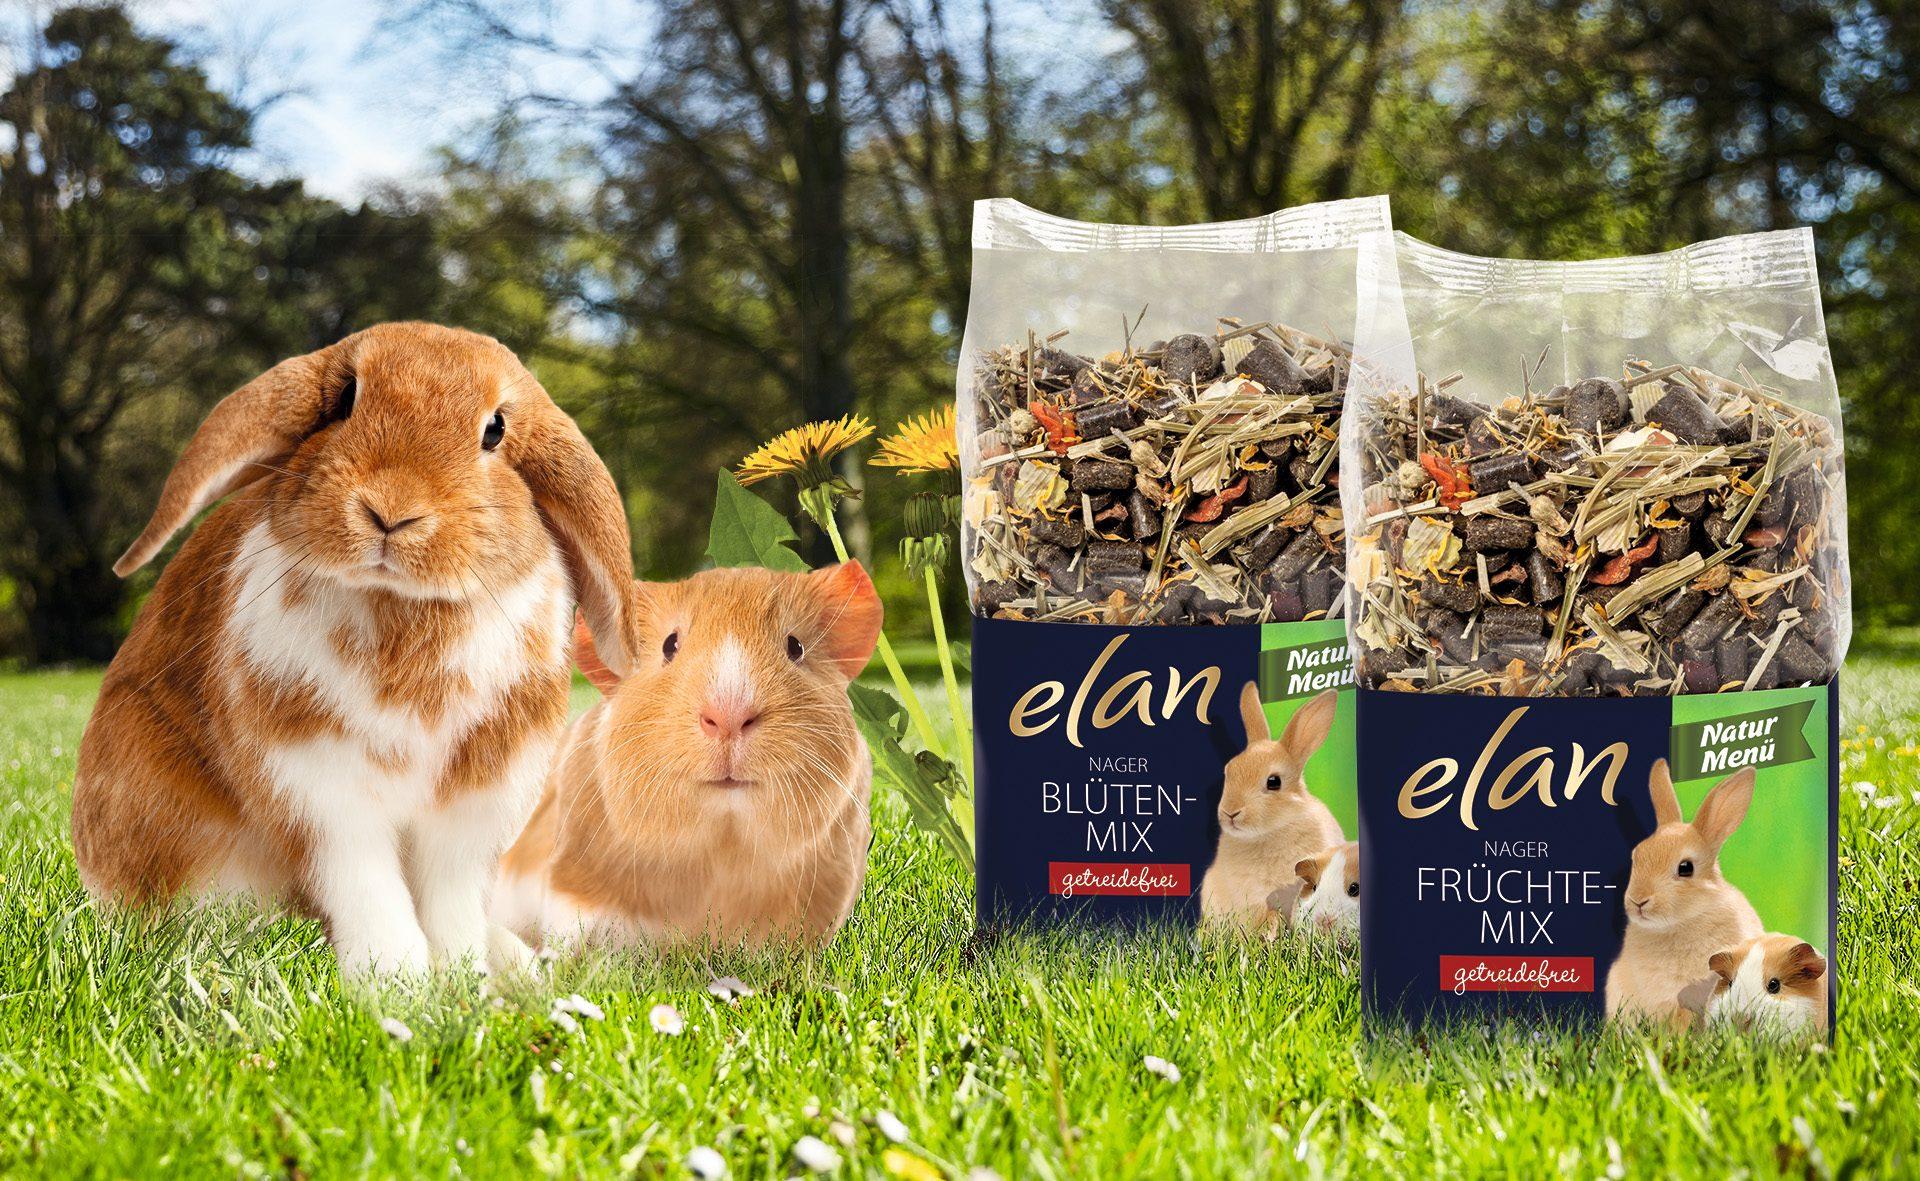 Verpackungsdesign Malvega - Referenz: Tierfutter, Elan